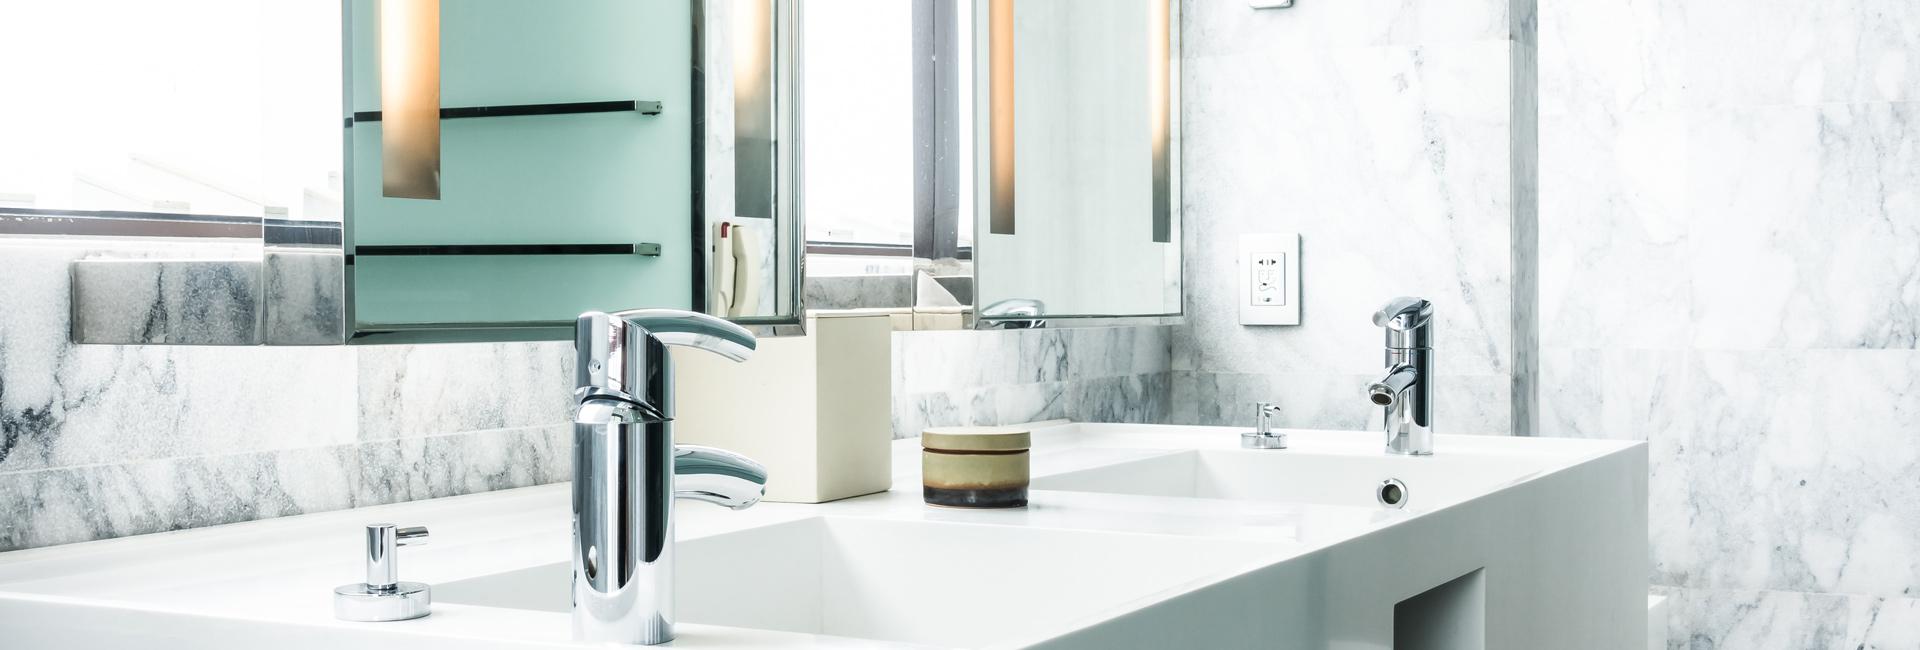 bathroom-remodeling-california